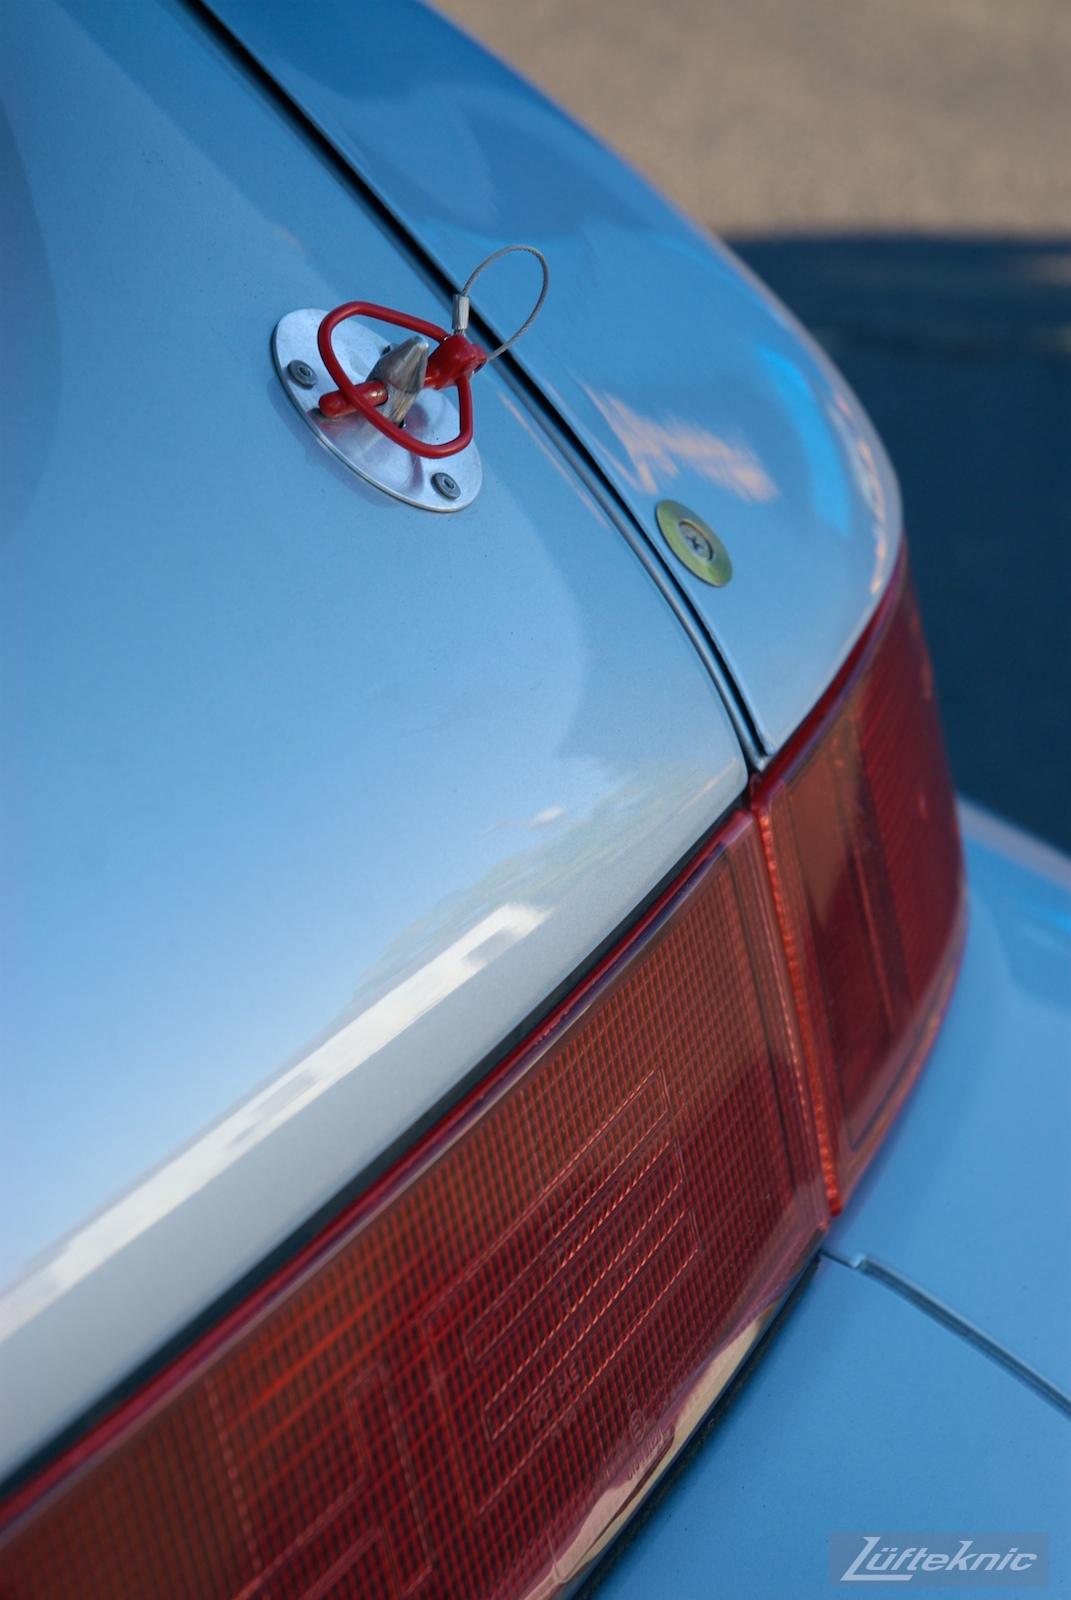 Detailed photo showing the RSR Porsche rear decklid fasteners.